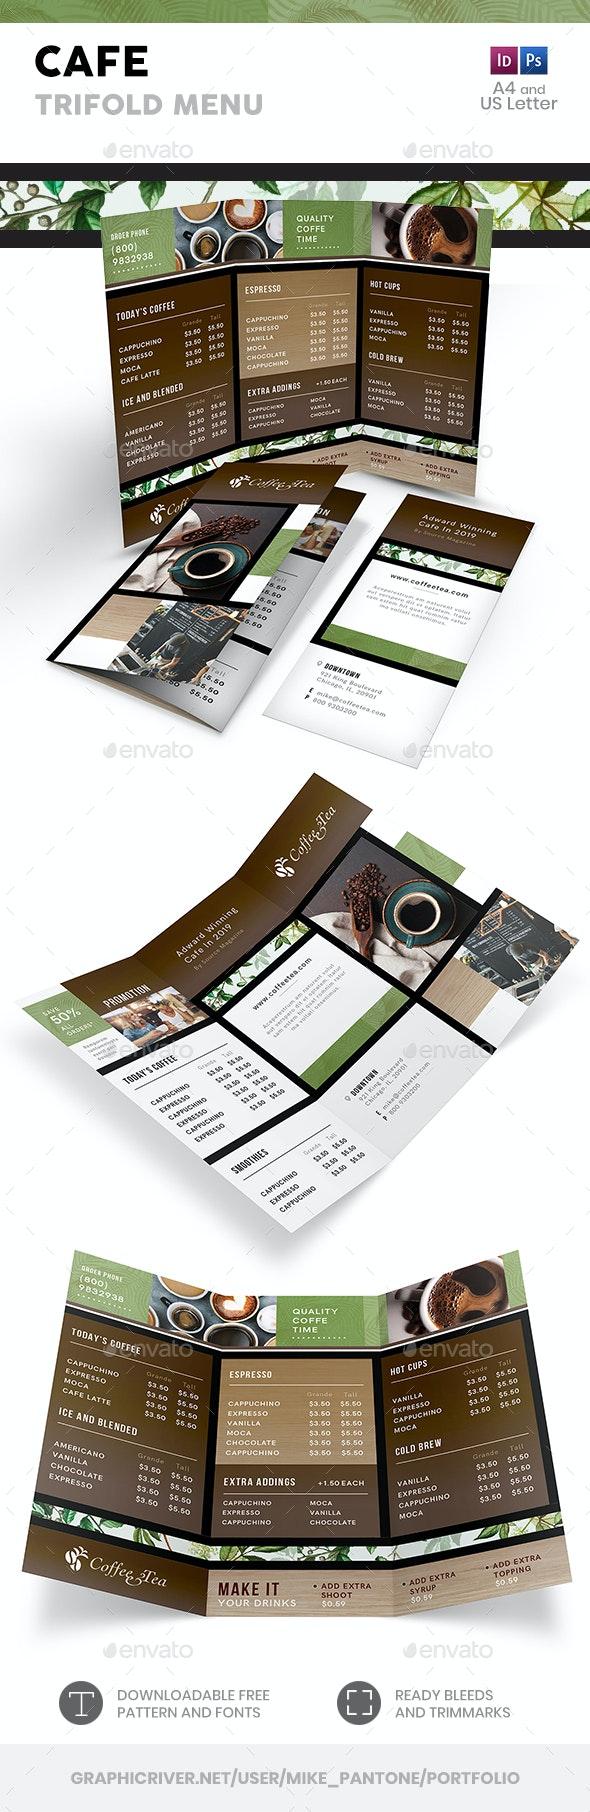 Cafe Trifold Menu 3 - Food Menus Print Templates